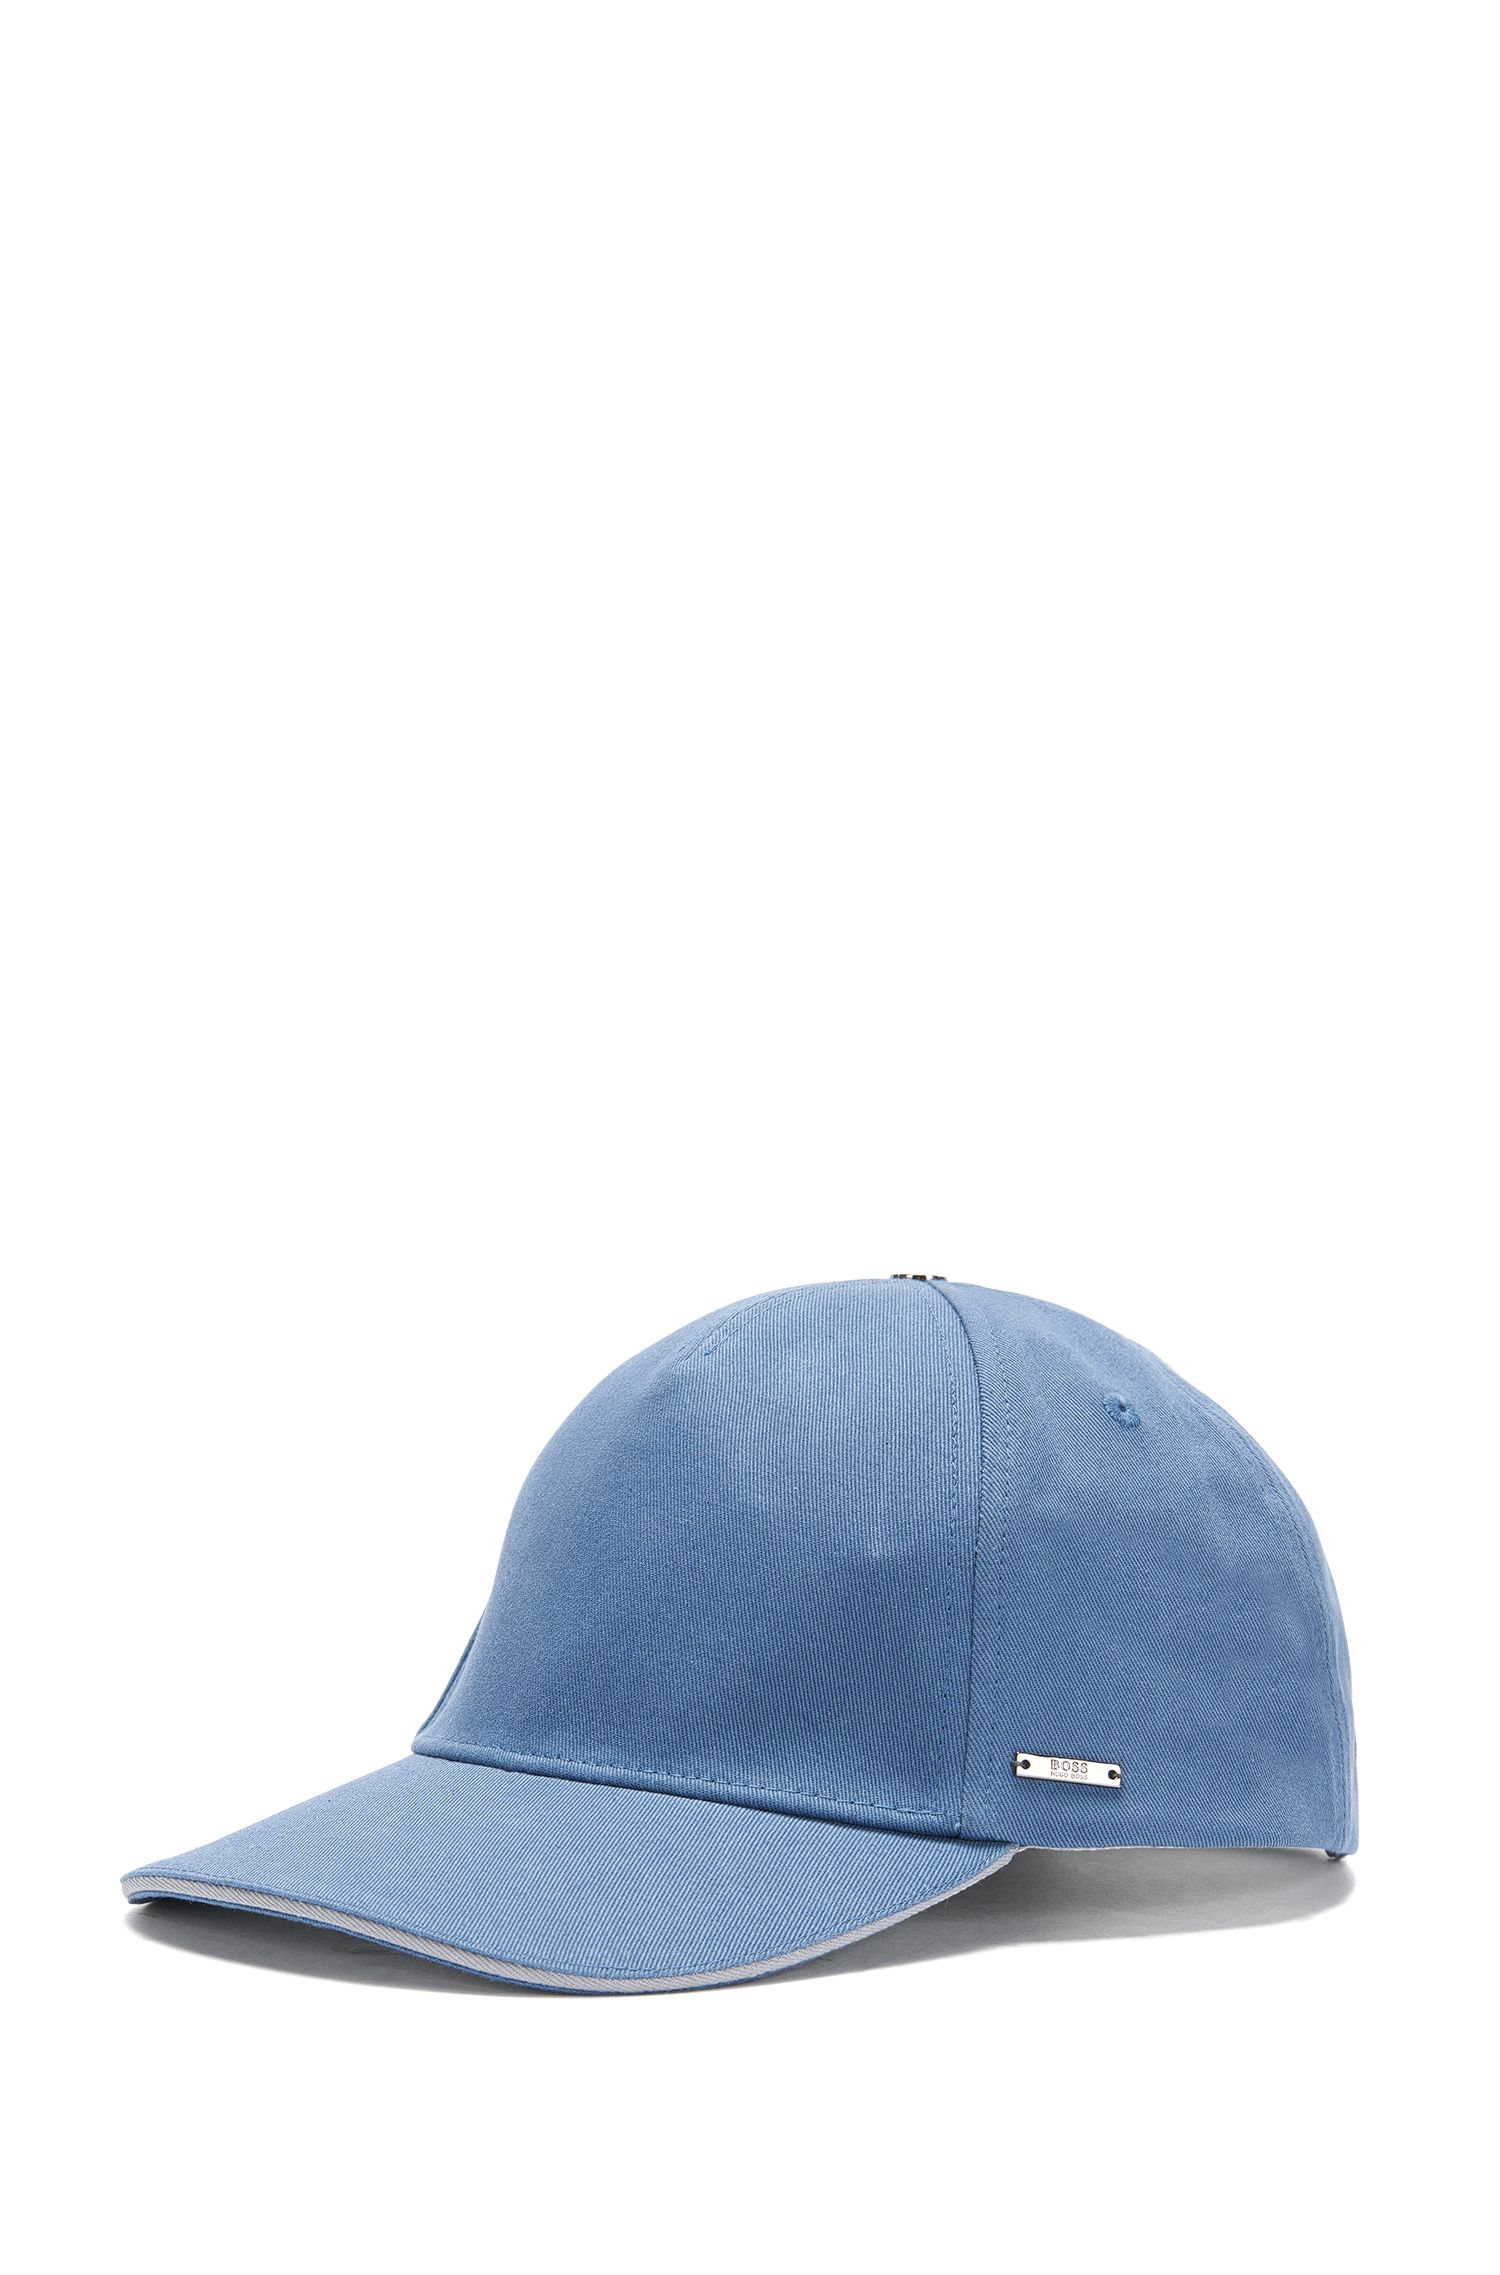 Unifarbene Cap aus Baumwolle: 'Serios'